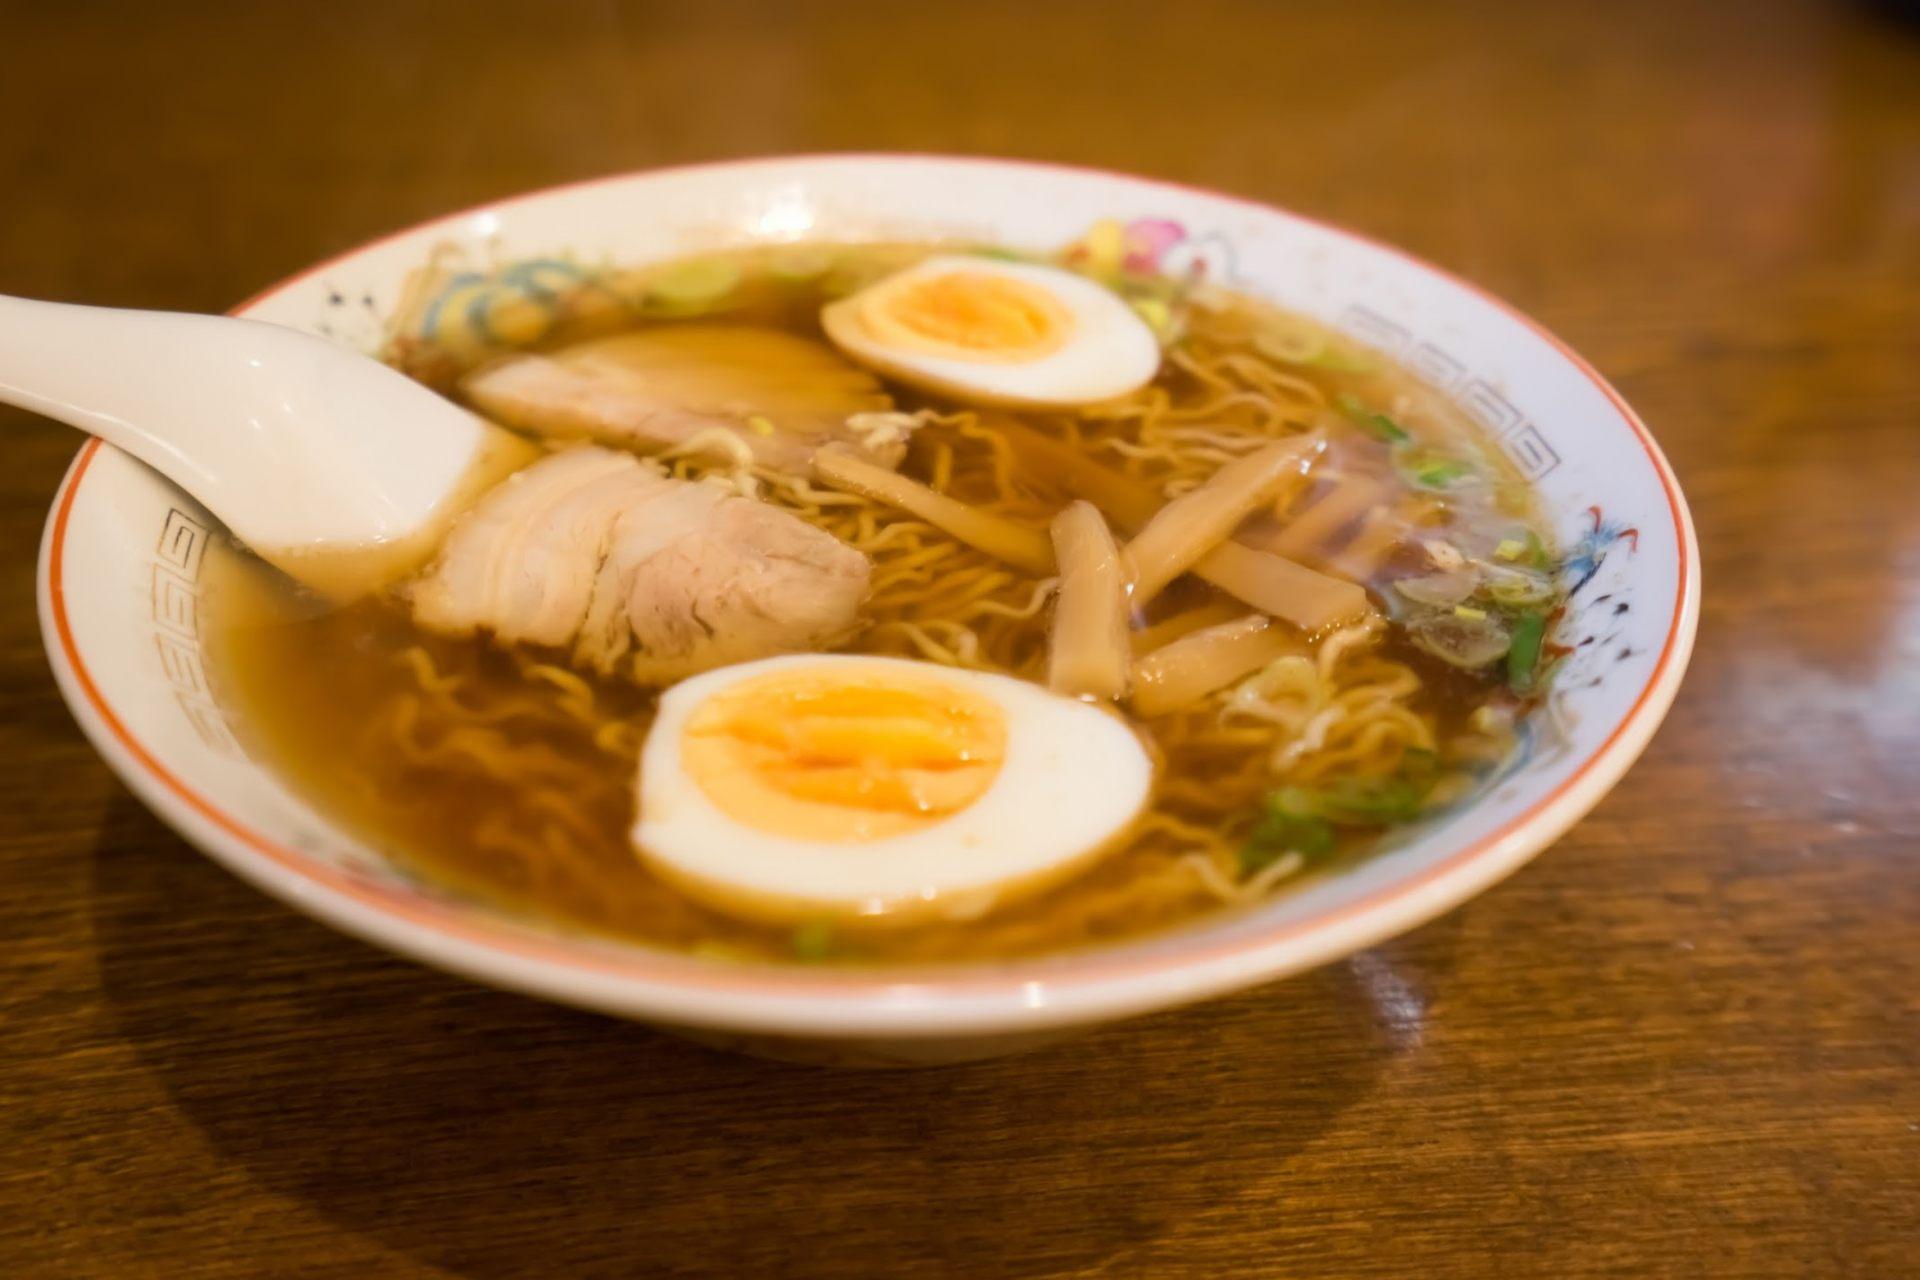 Chuka Soba 700 yen, Boiled Egg 50 yen